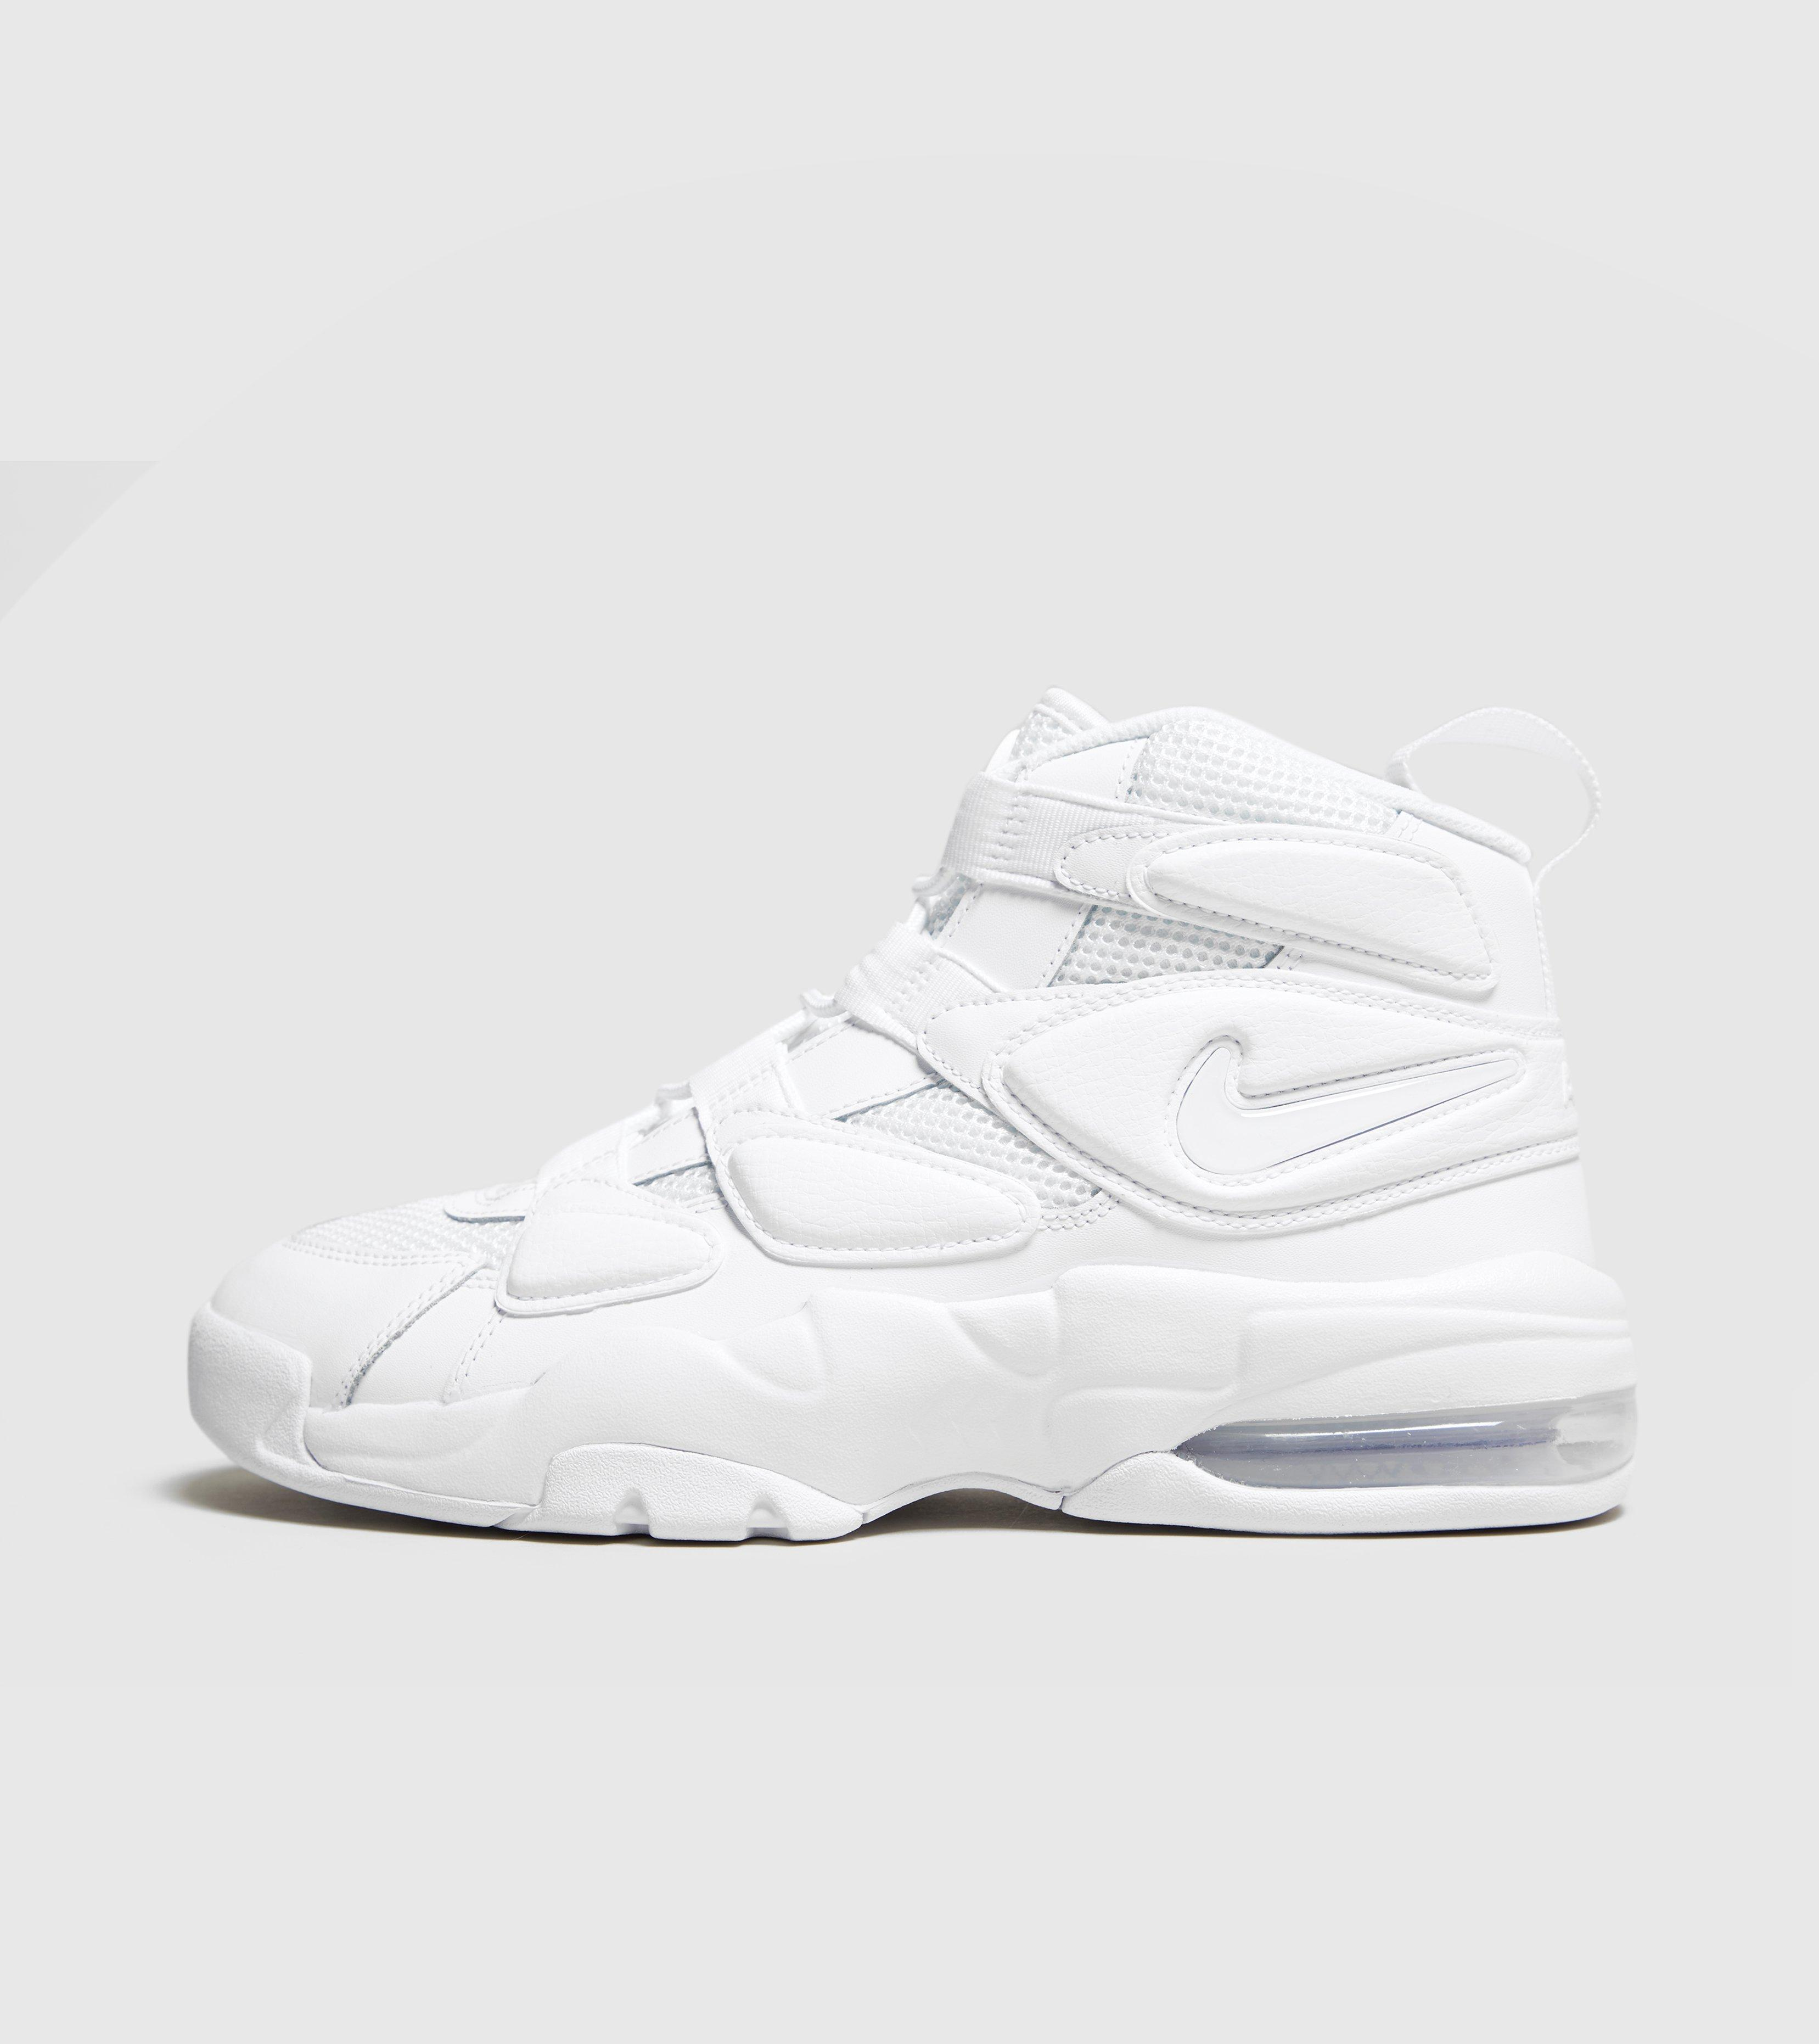 Lyst - Nike Air Max 2 Uptempo 94 in White for Men 56ec21bb8